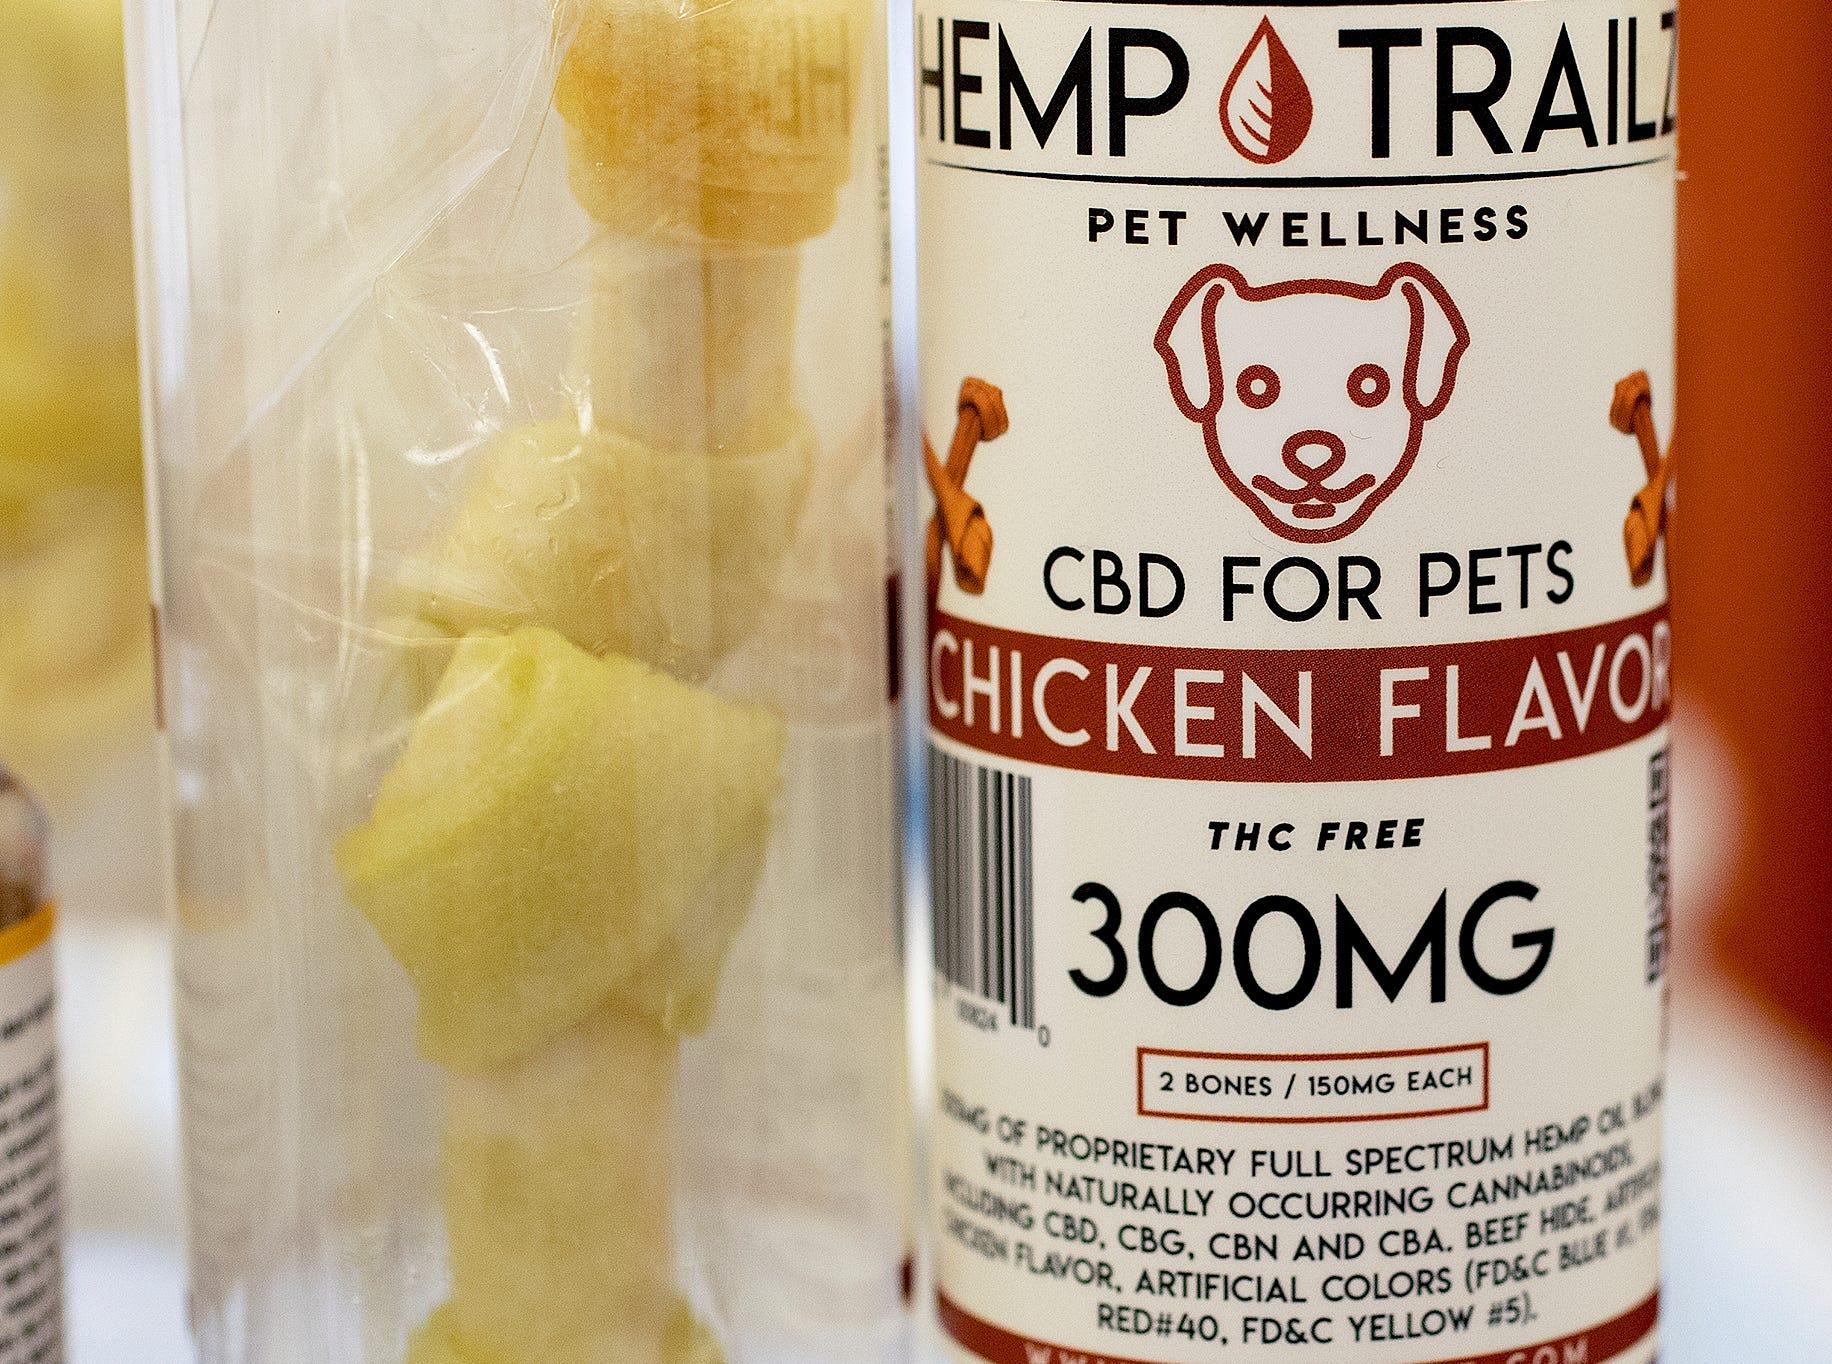 Hemp Trailz CBD calming dog treats at the CBD Expo at the Marriott East in Indianapolis on Friday, Mar. 15, 2019.